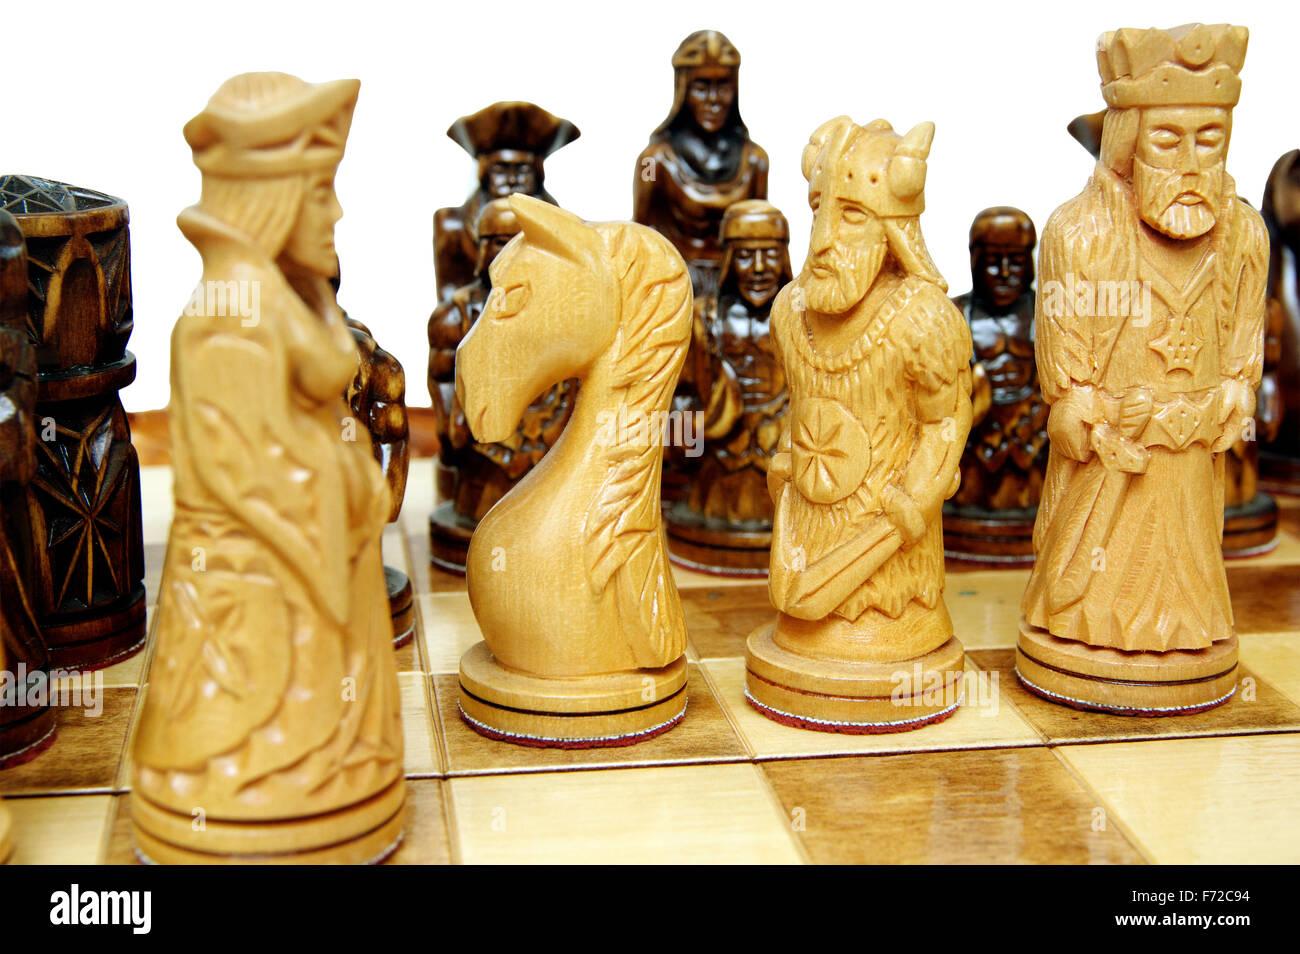 aa5dab075299 wood chess figures handmade stay on board Stock Photo  90408000 - Alamy